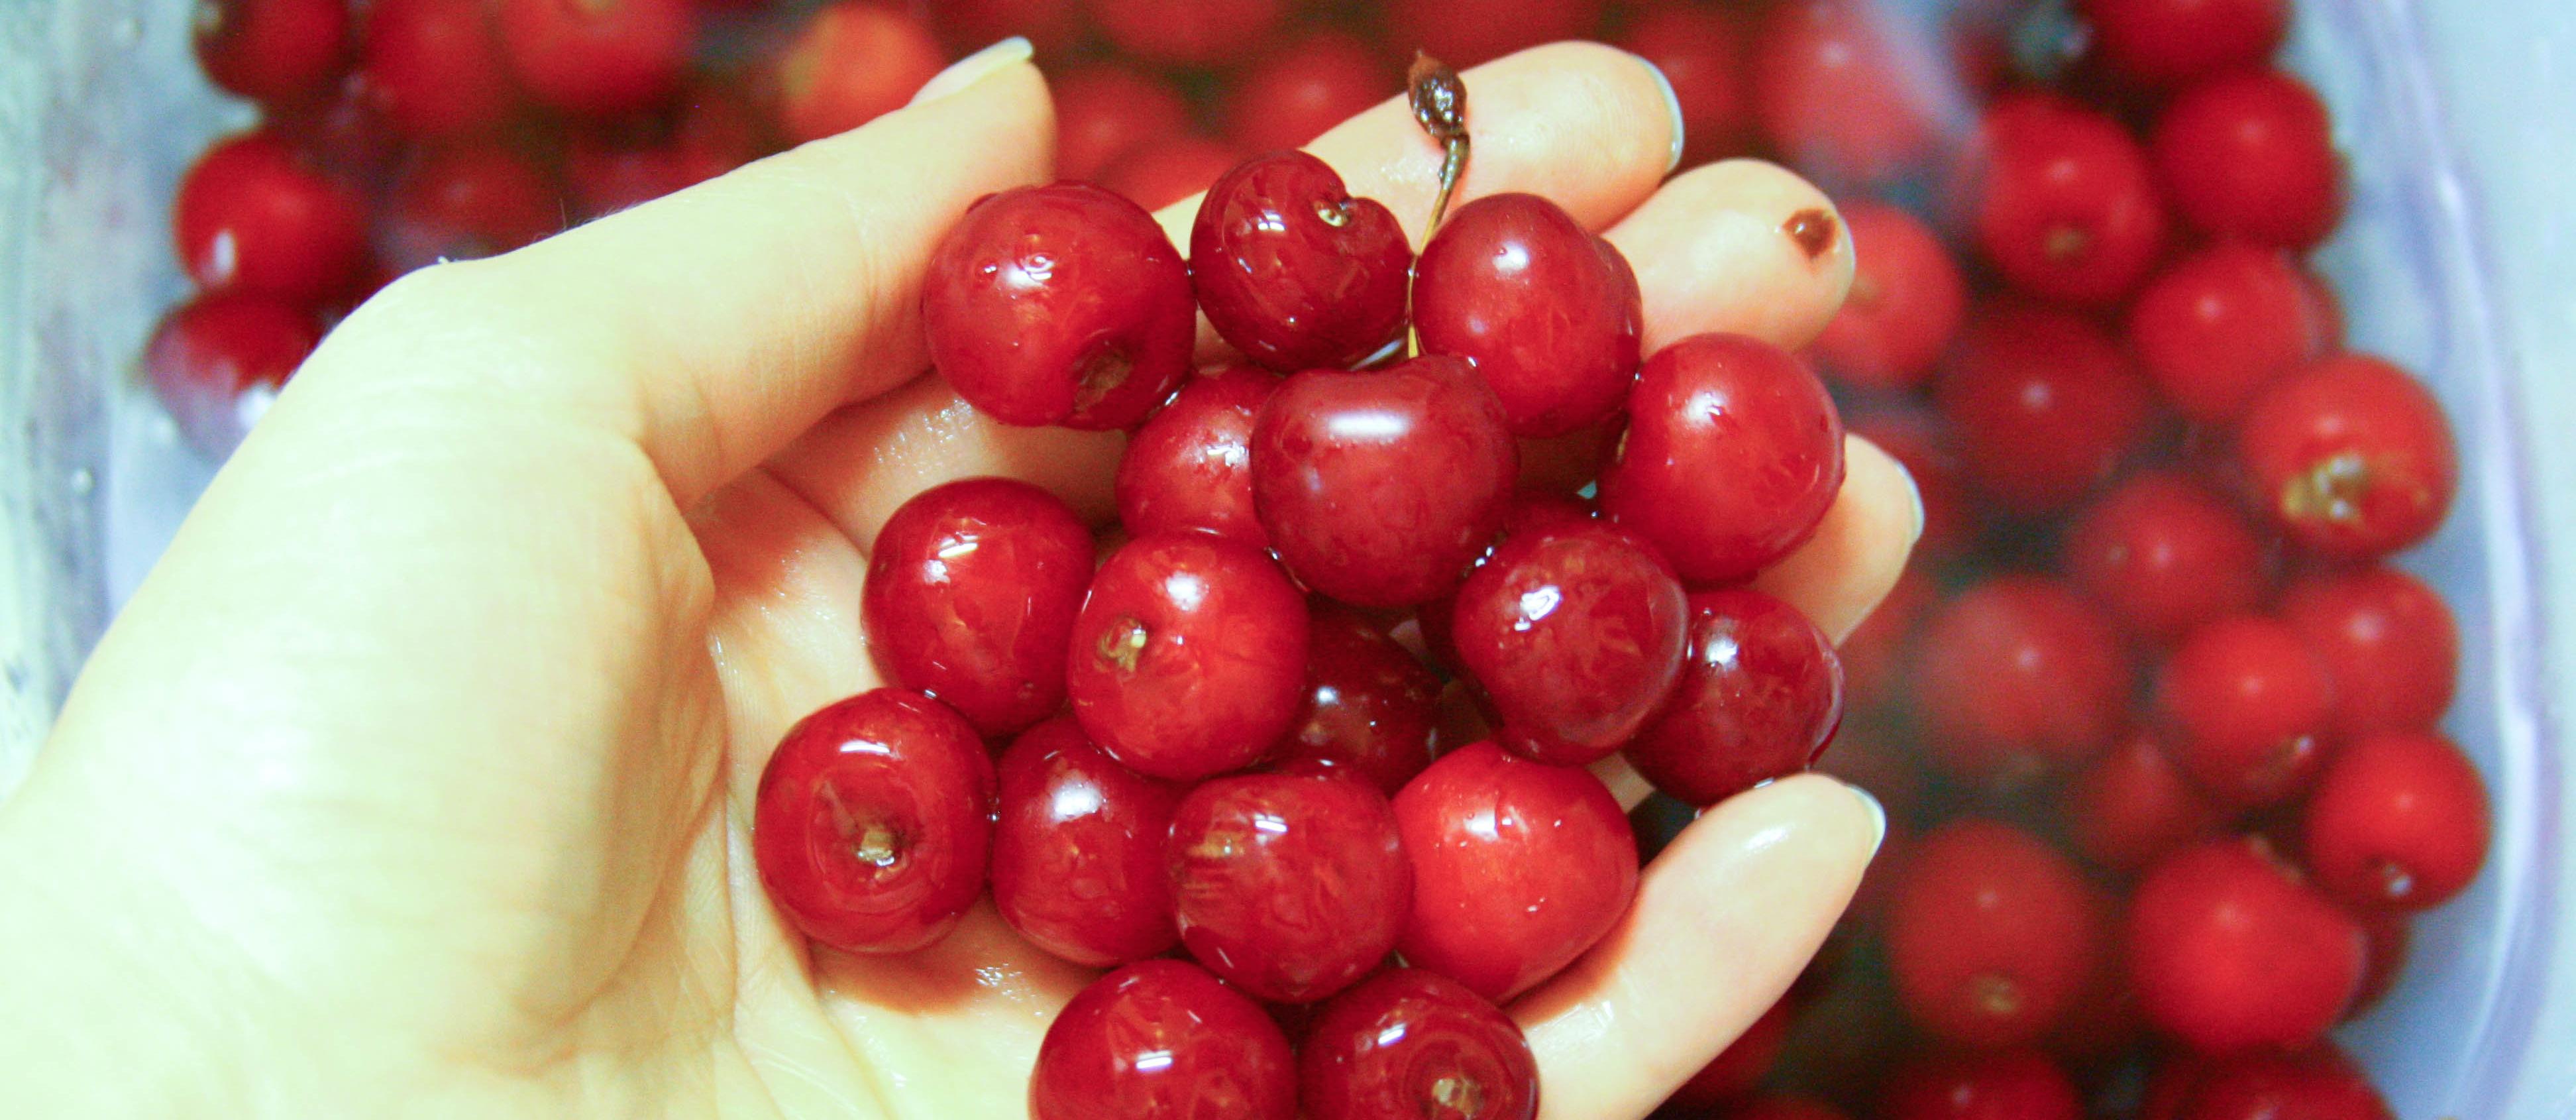 Foods with Natural Melatonin